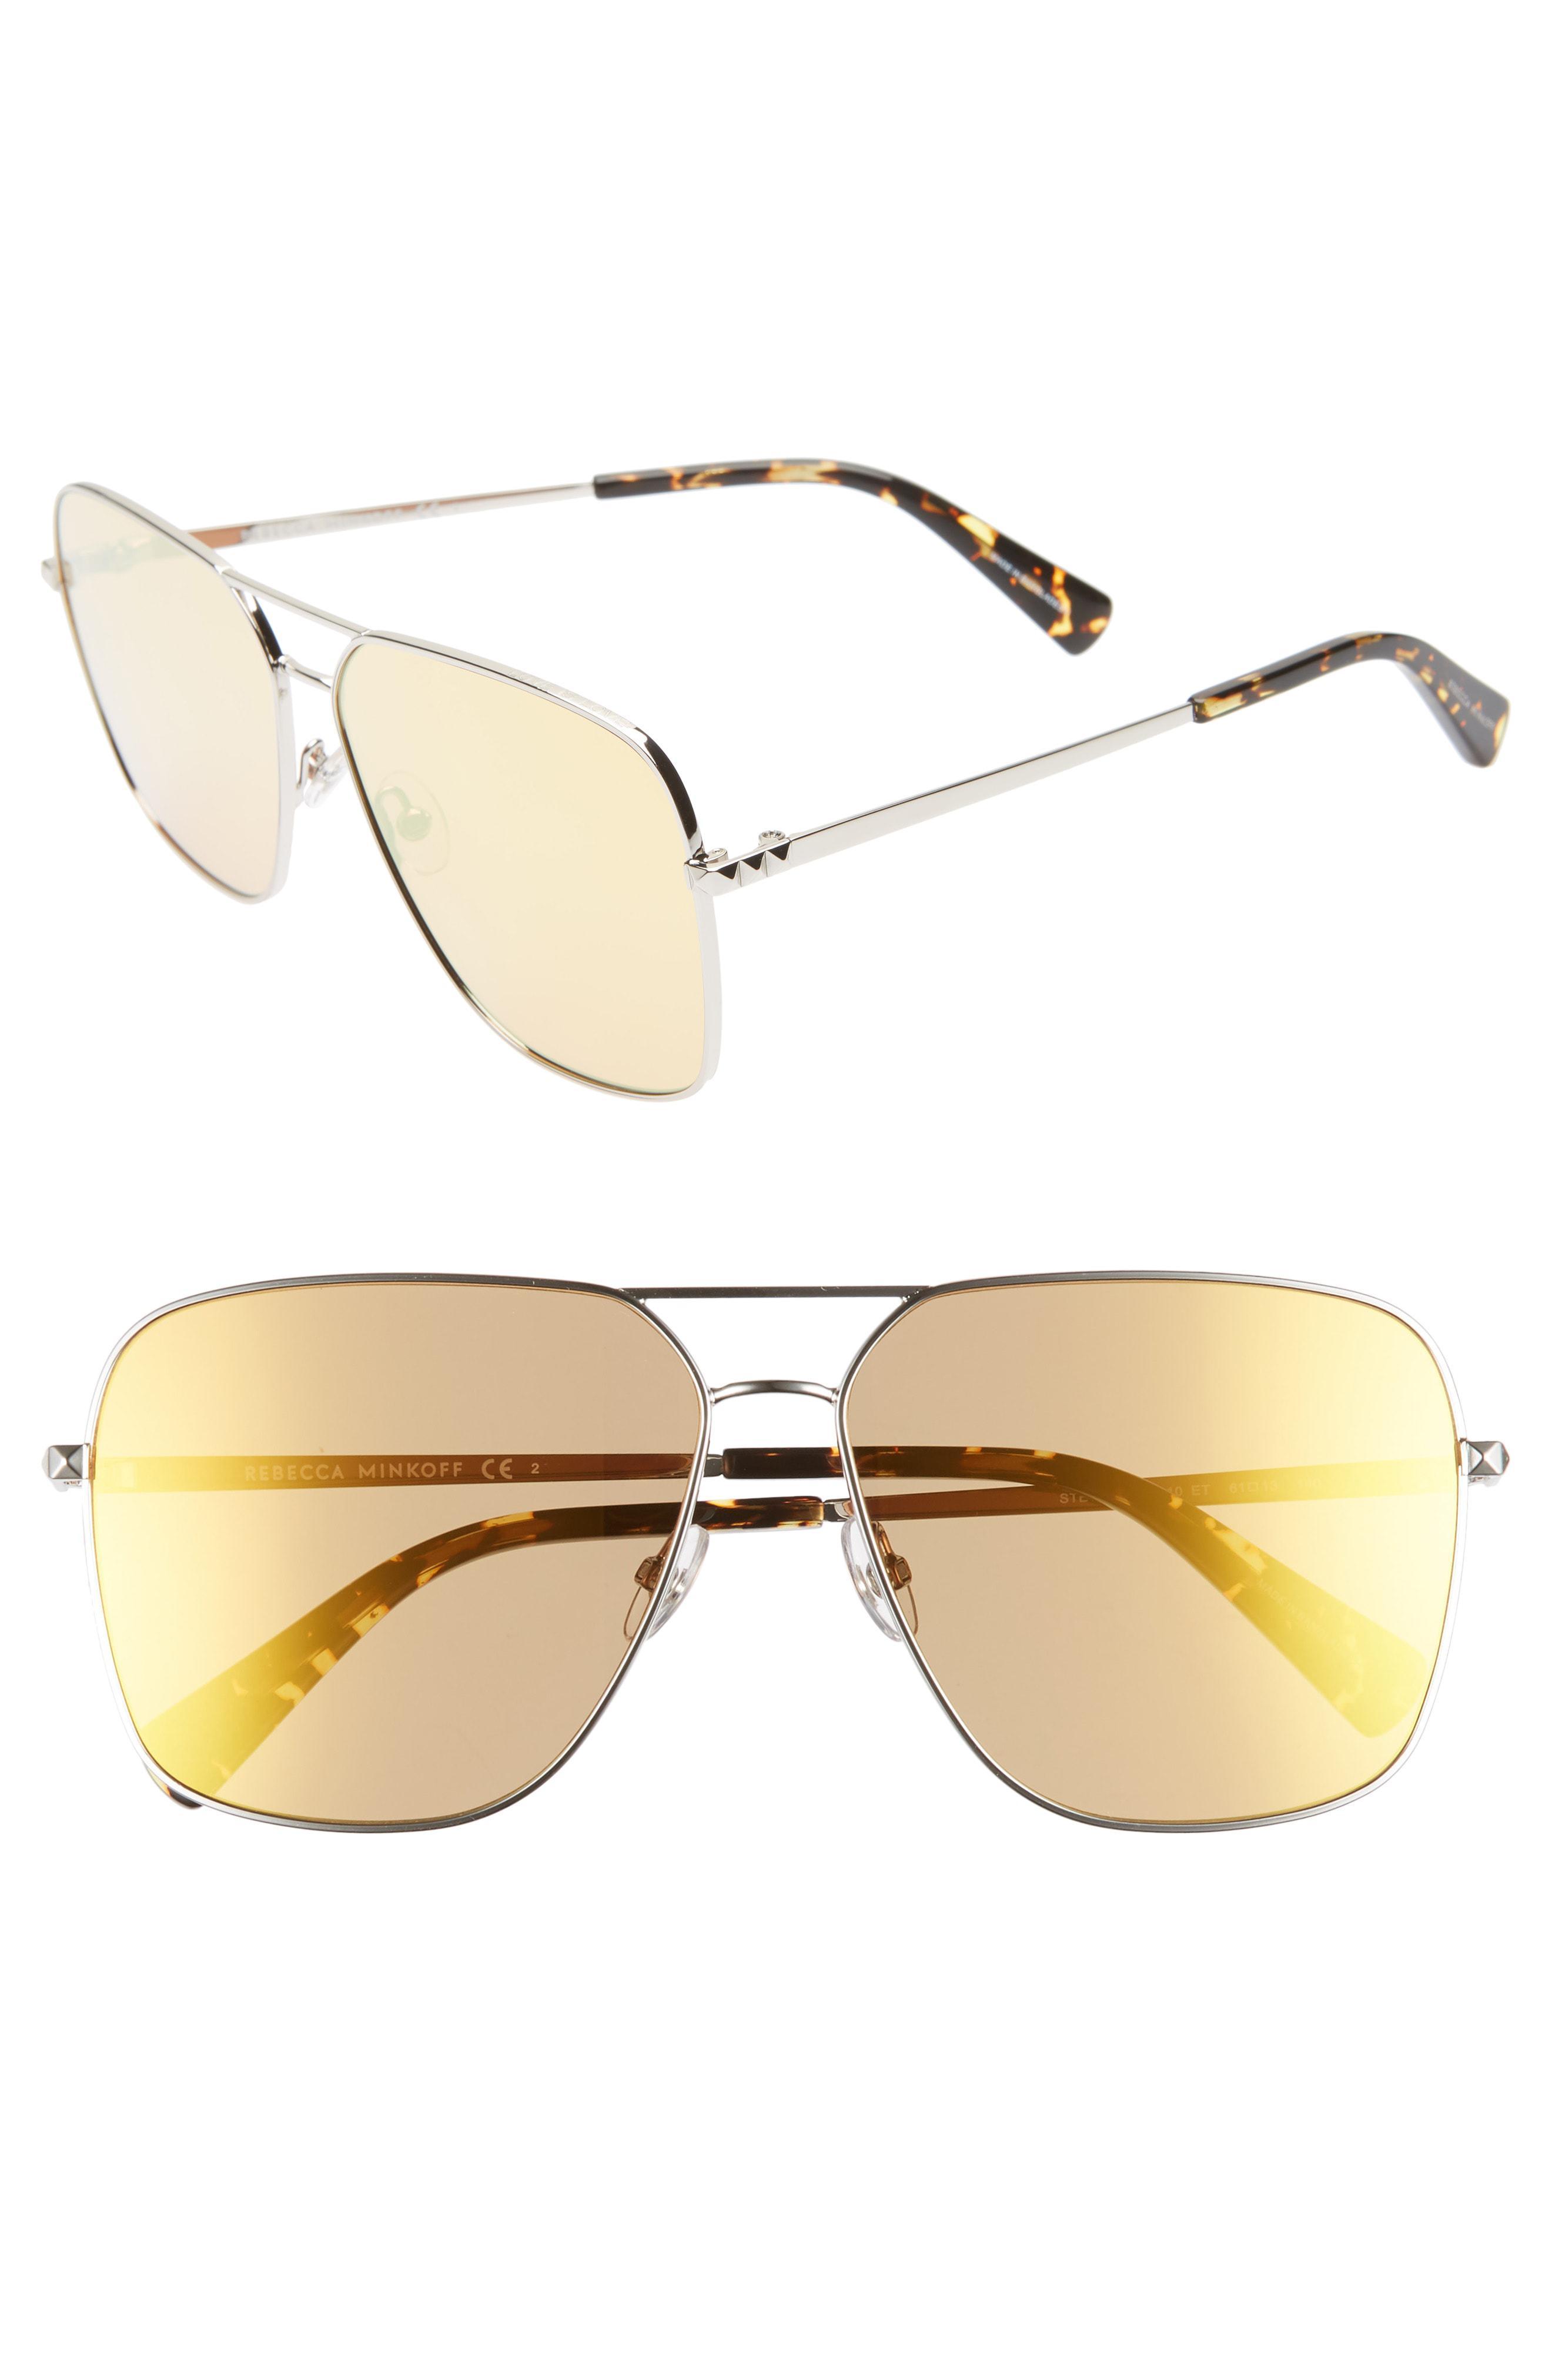 45c392da9923f Lyst - Rebecca Minkoff Stevie3 61mm Aviator Sunglasses - Palladium ...